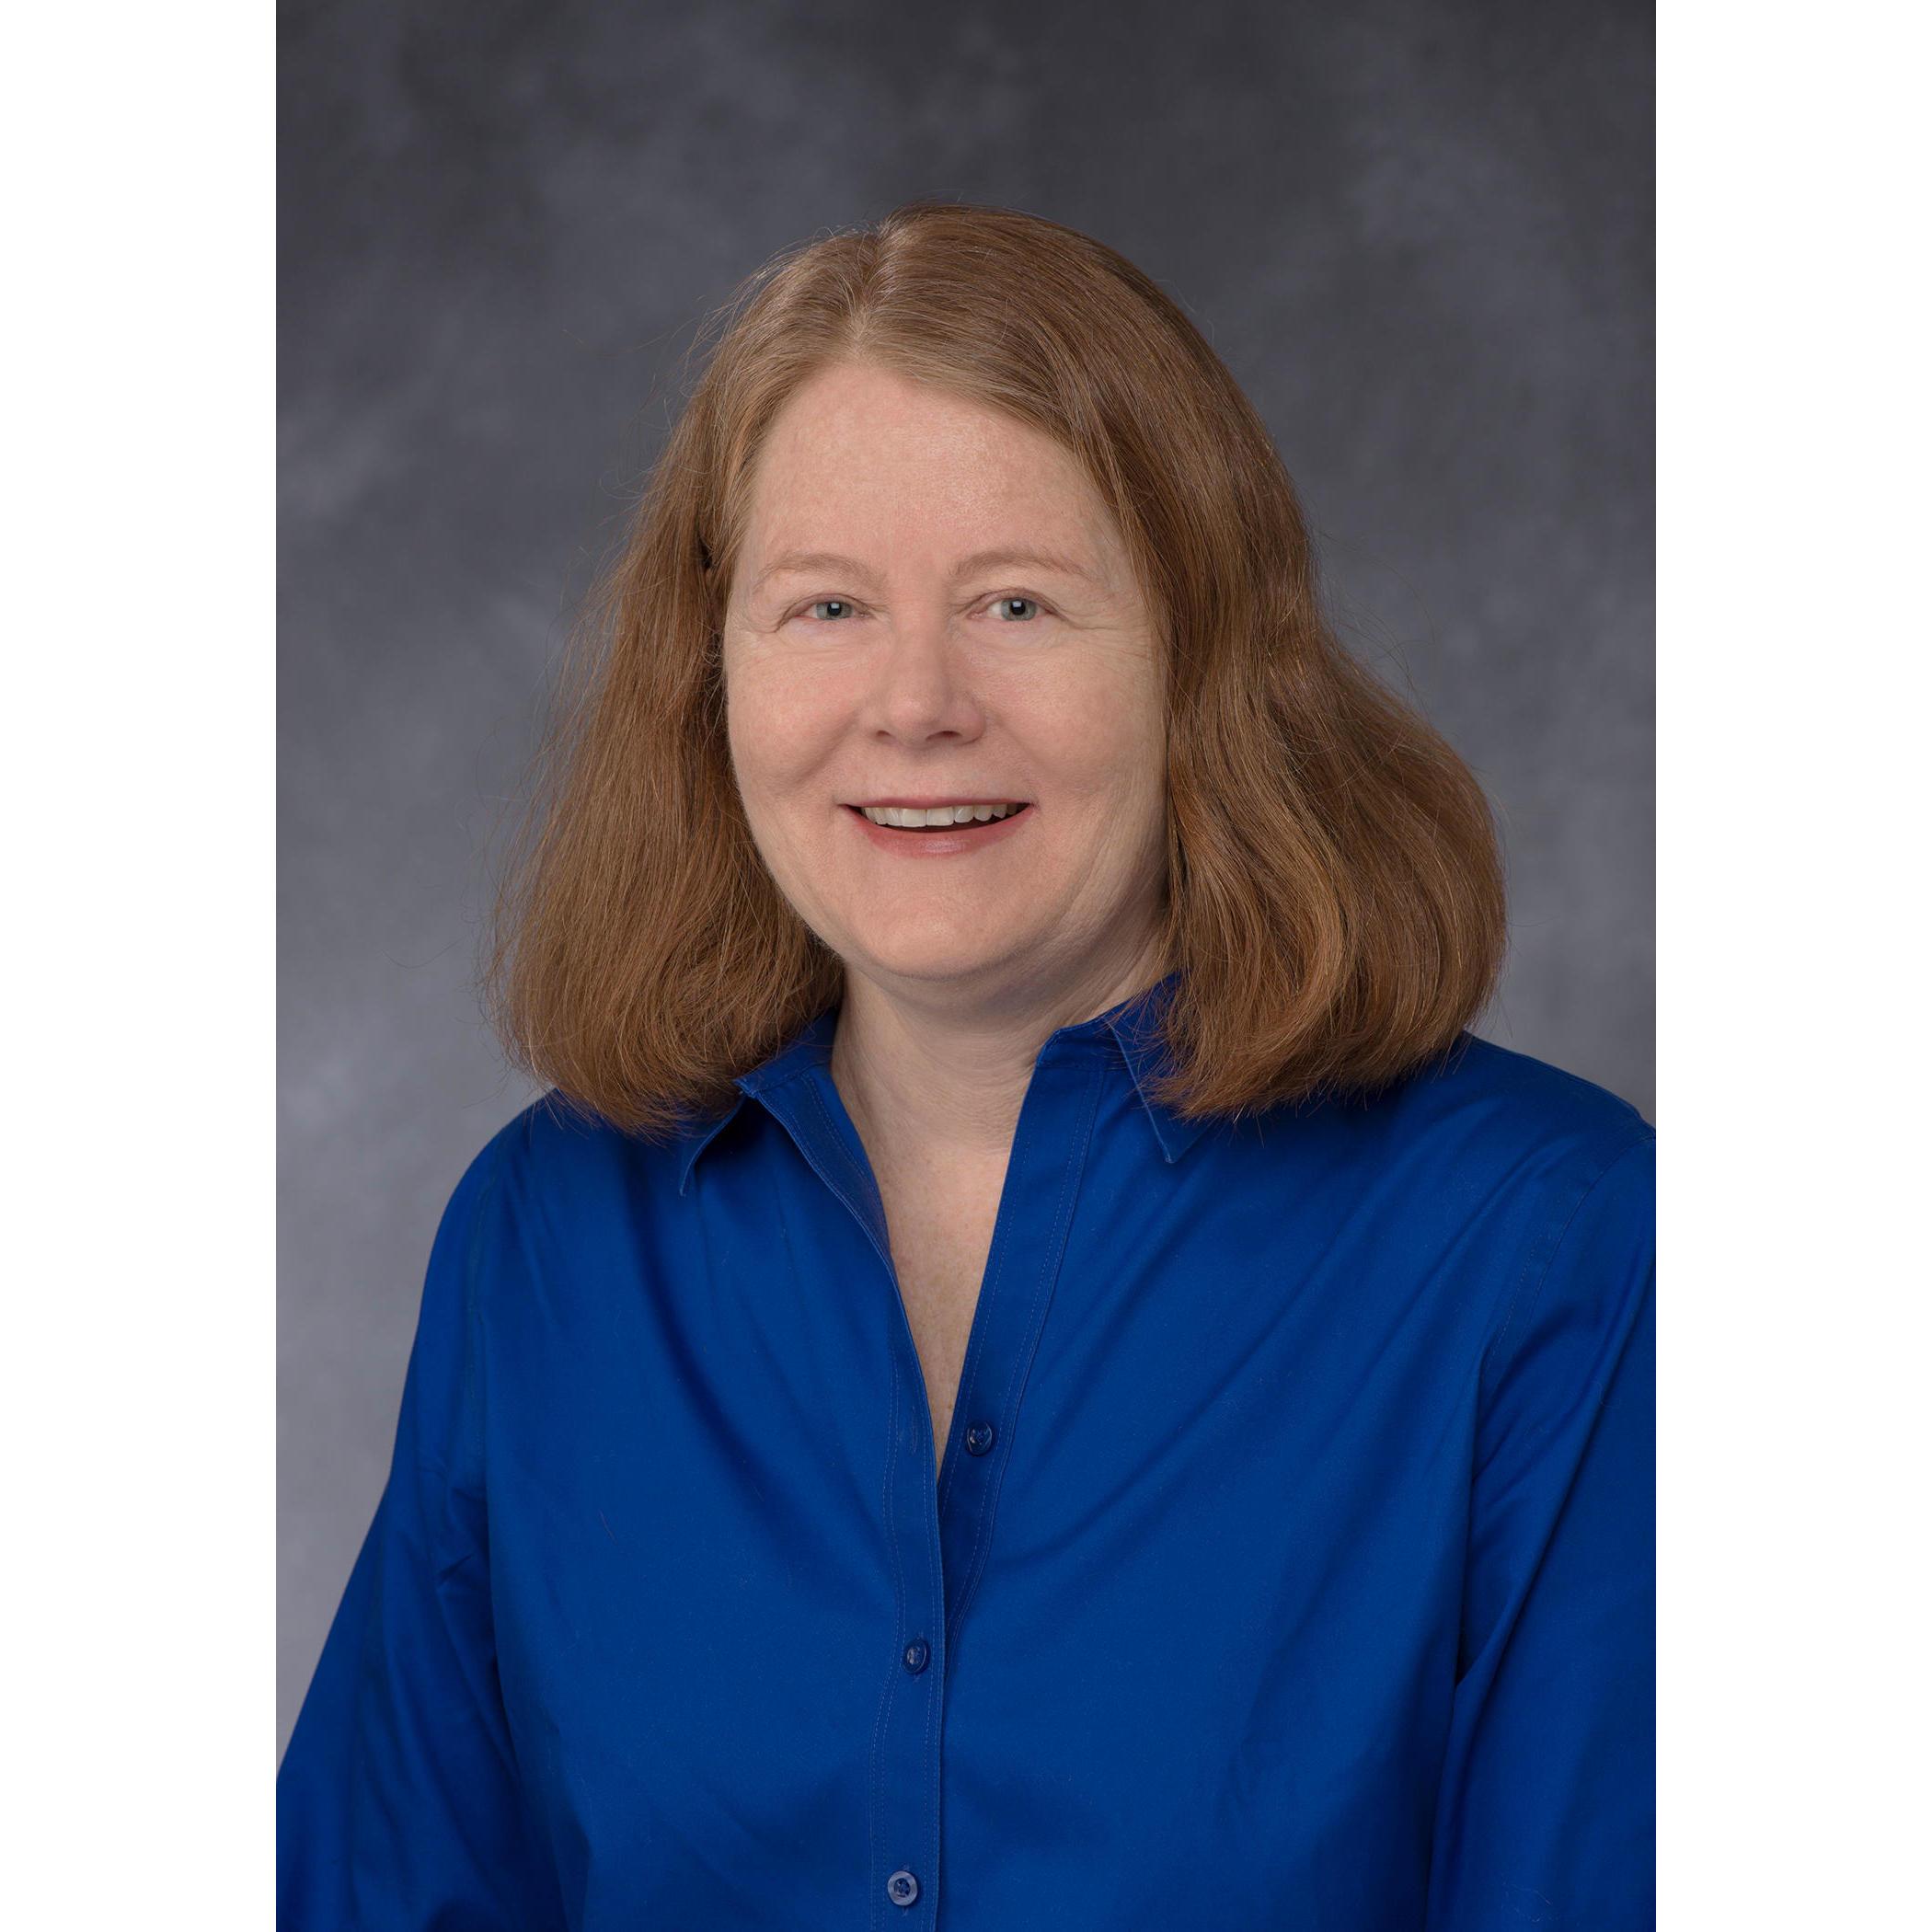 Diane Shuck